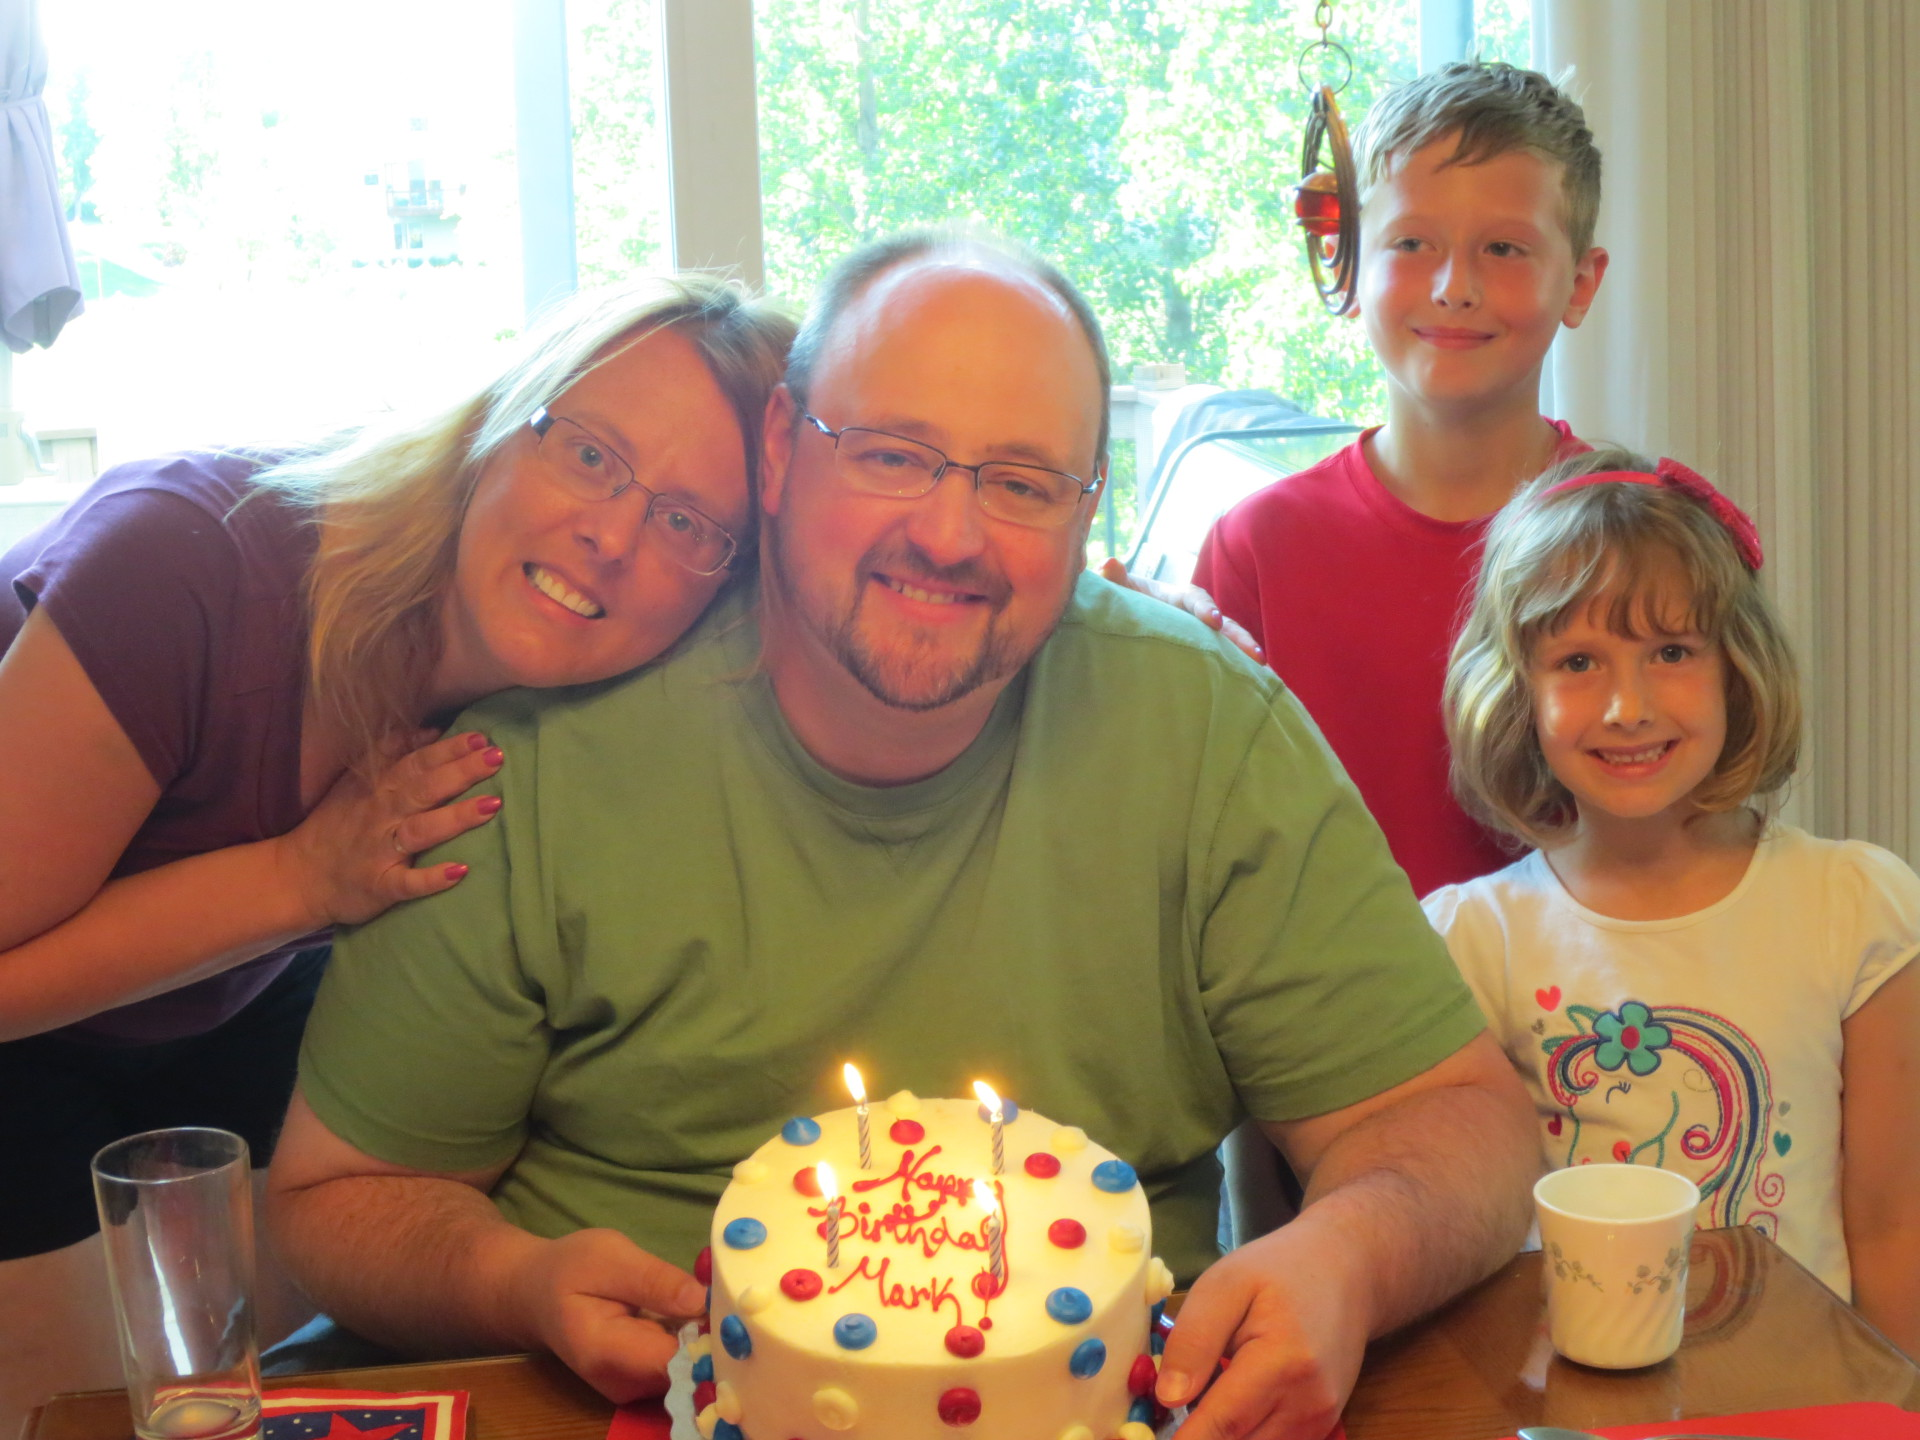 Mark' birthday -2014